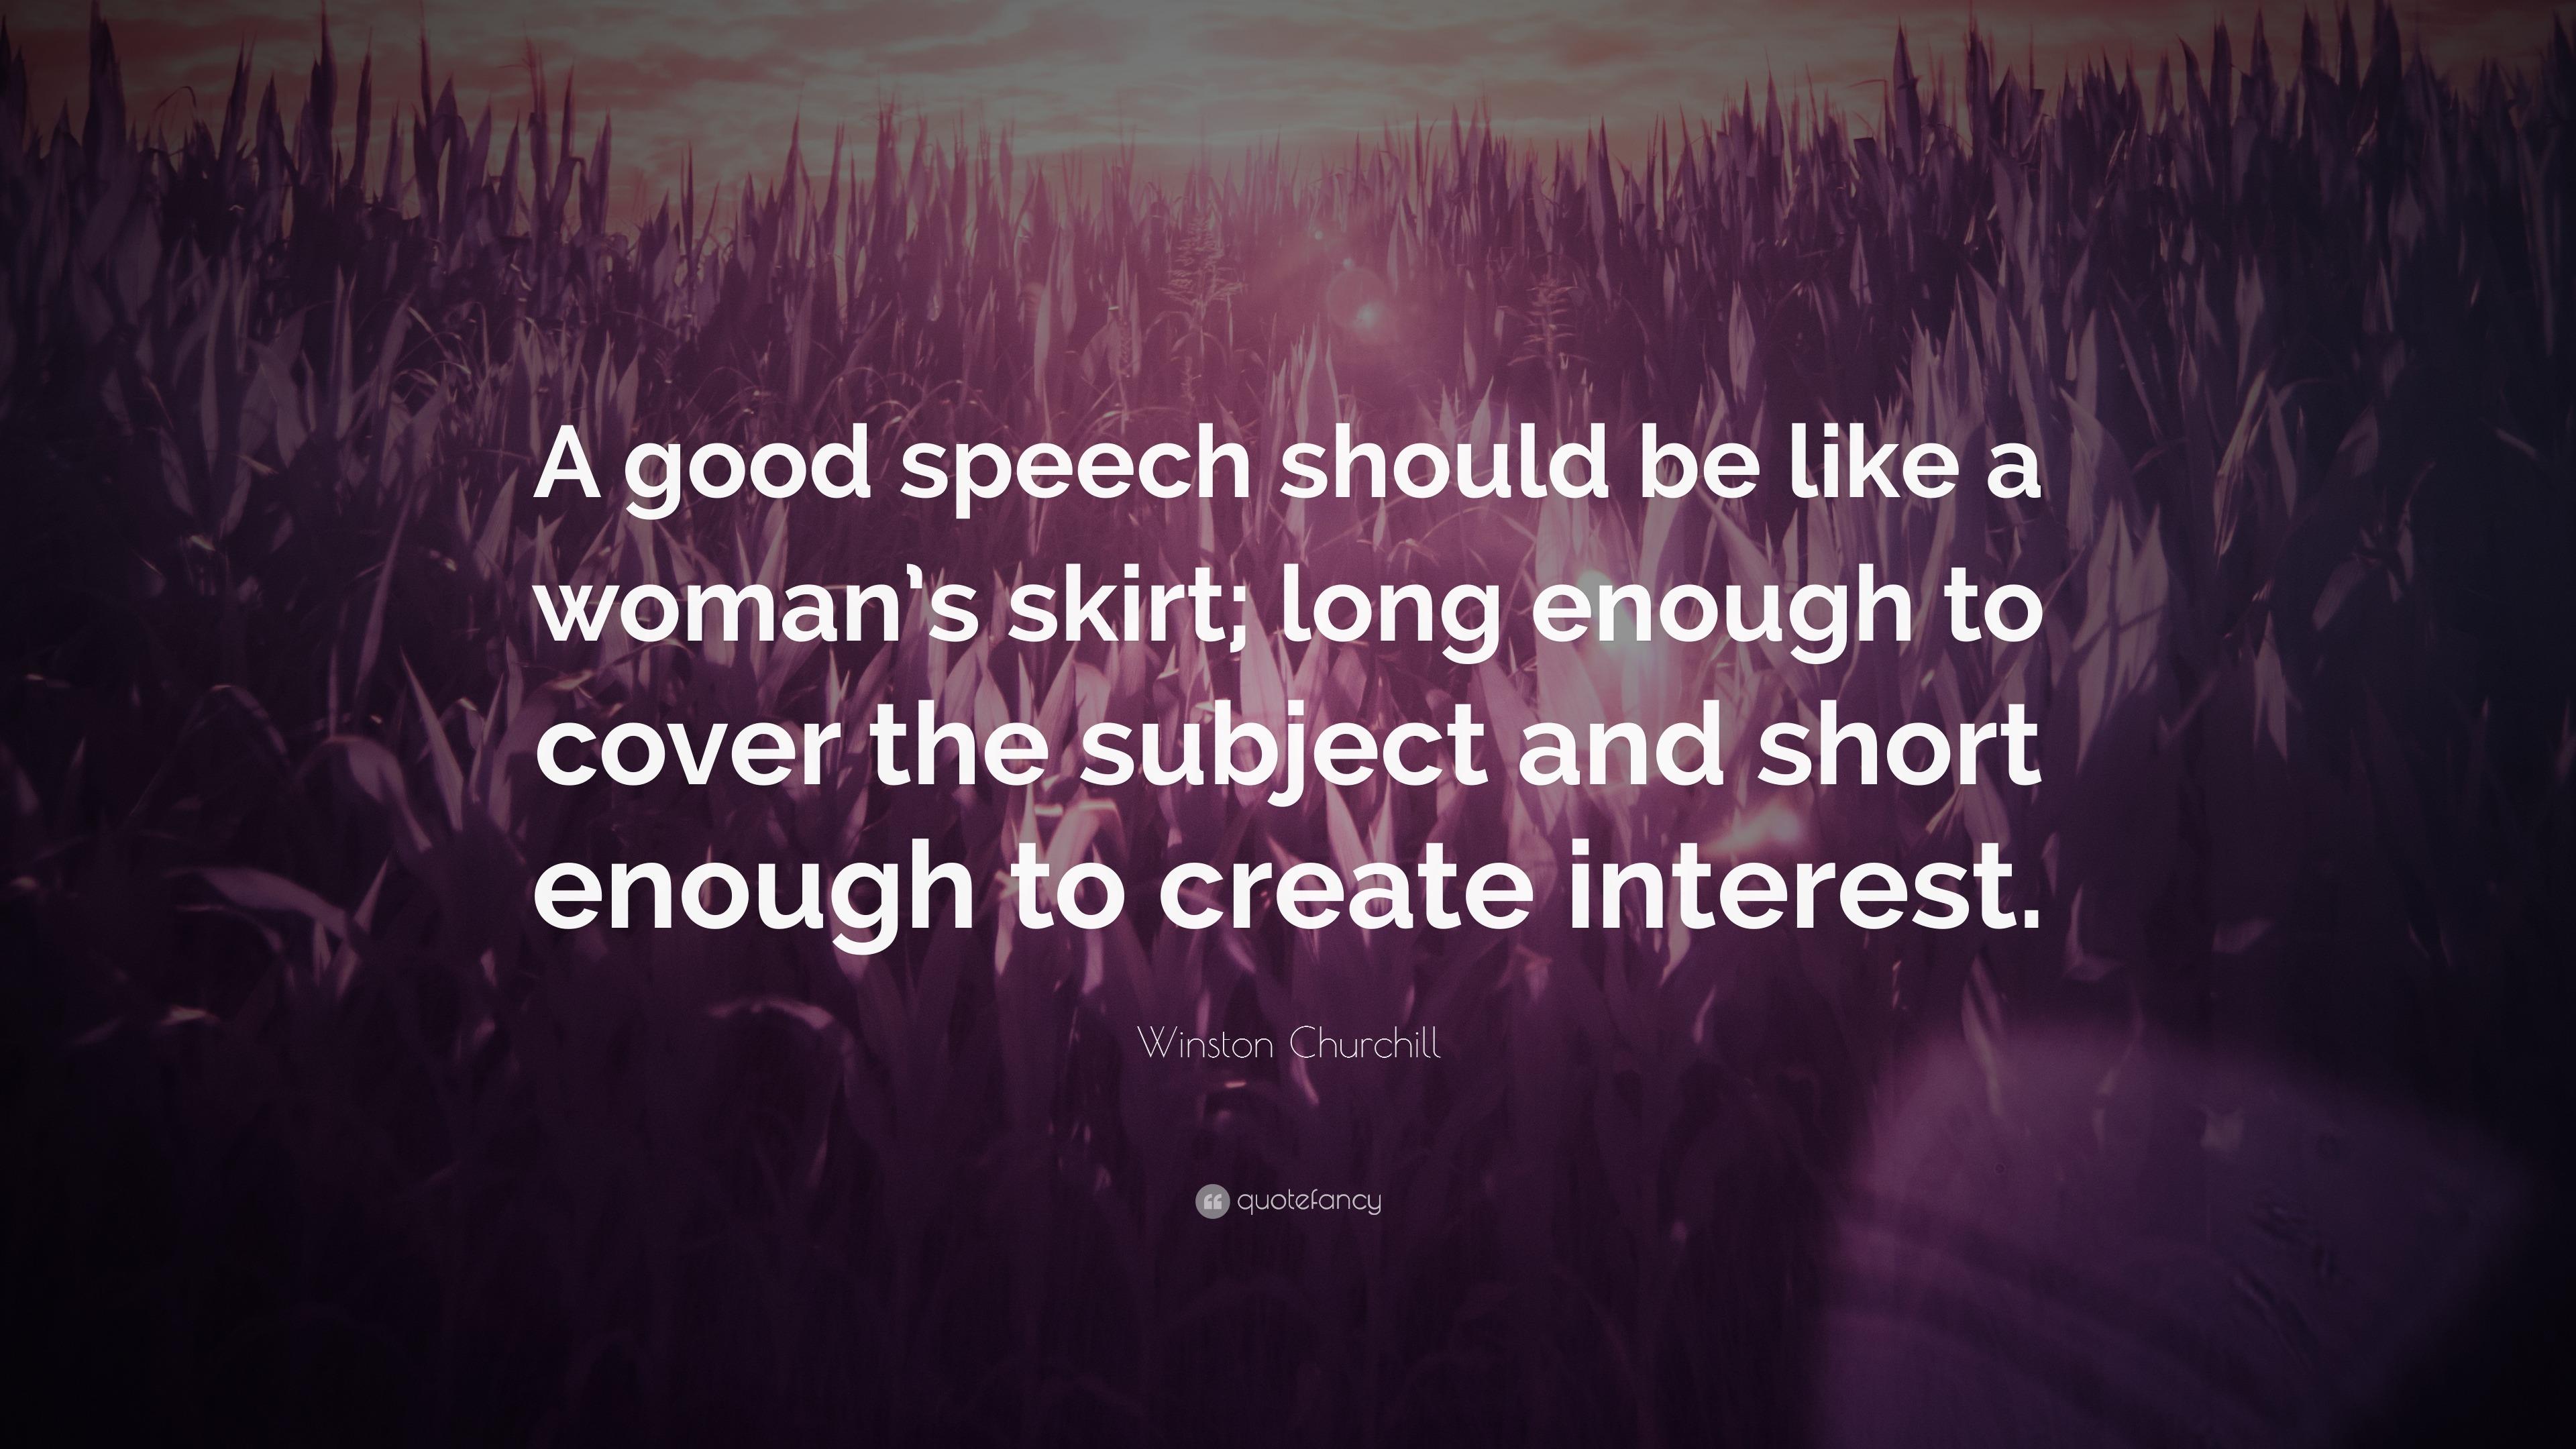 winston churchill quote   u201ca good speech should be like a